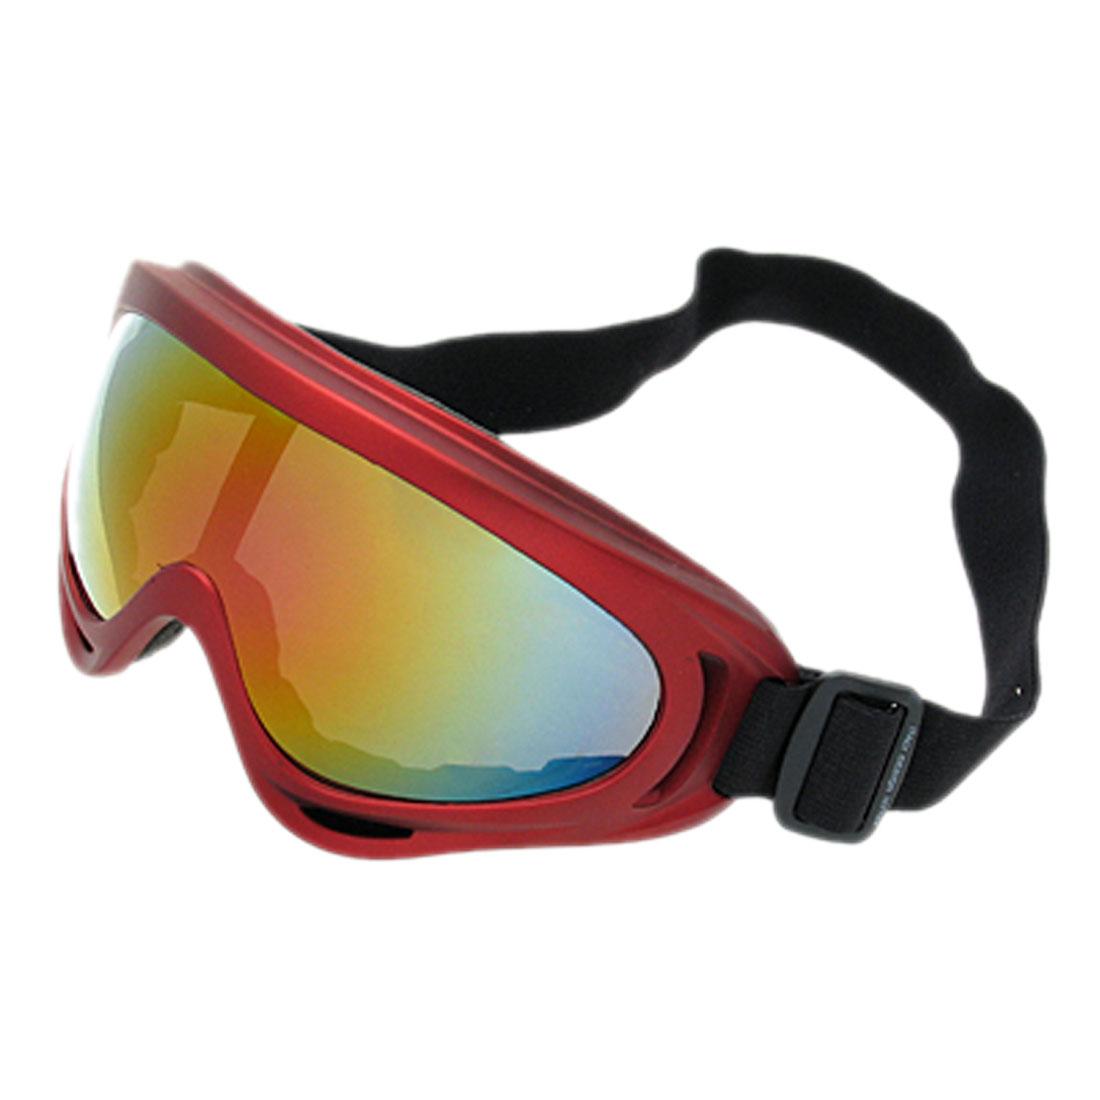 Aspen Mars - Skate Sports Glasses Snowboard Ski Goggles (Red Frame + Lens)- NV123